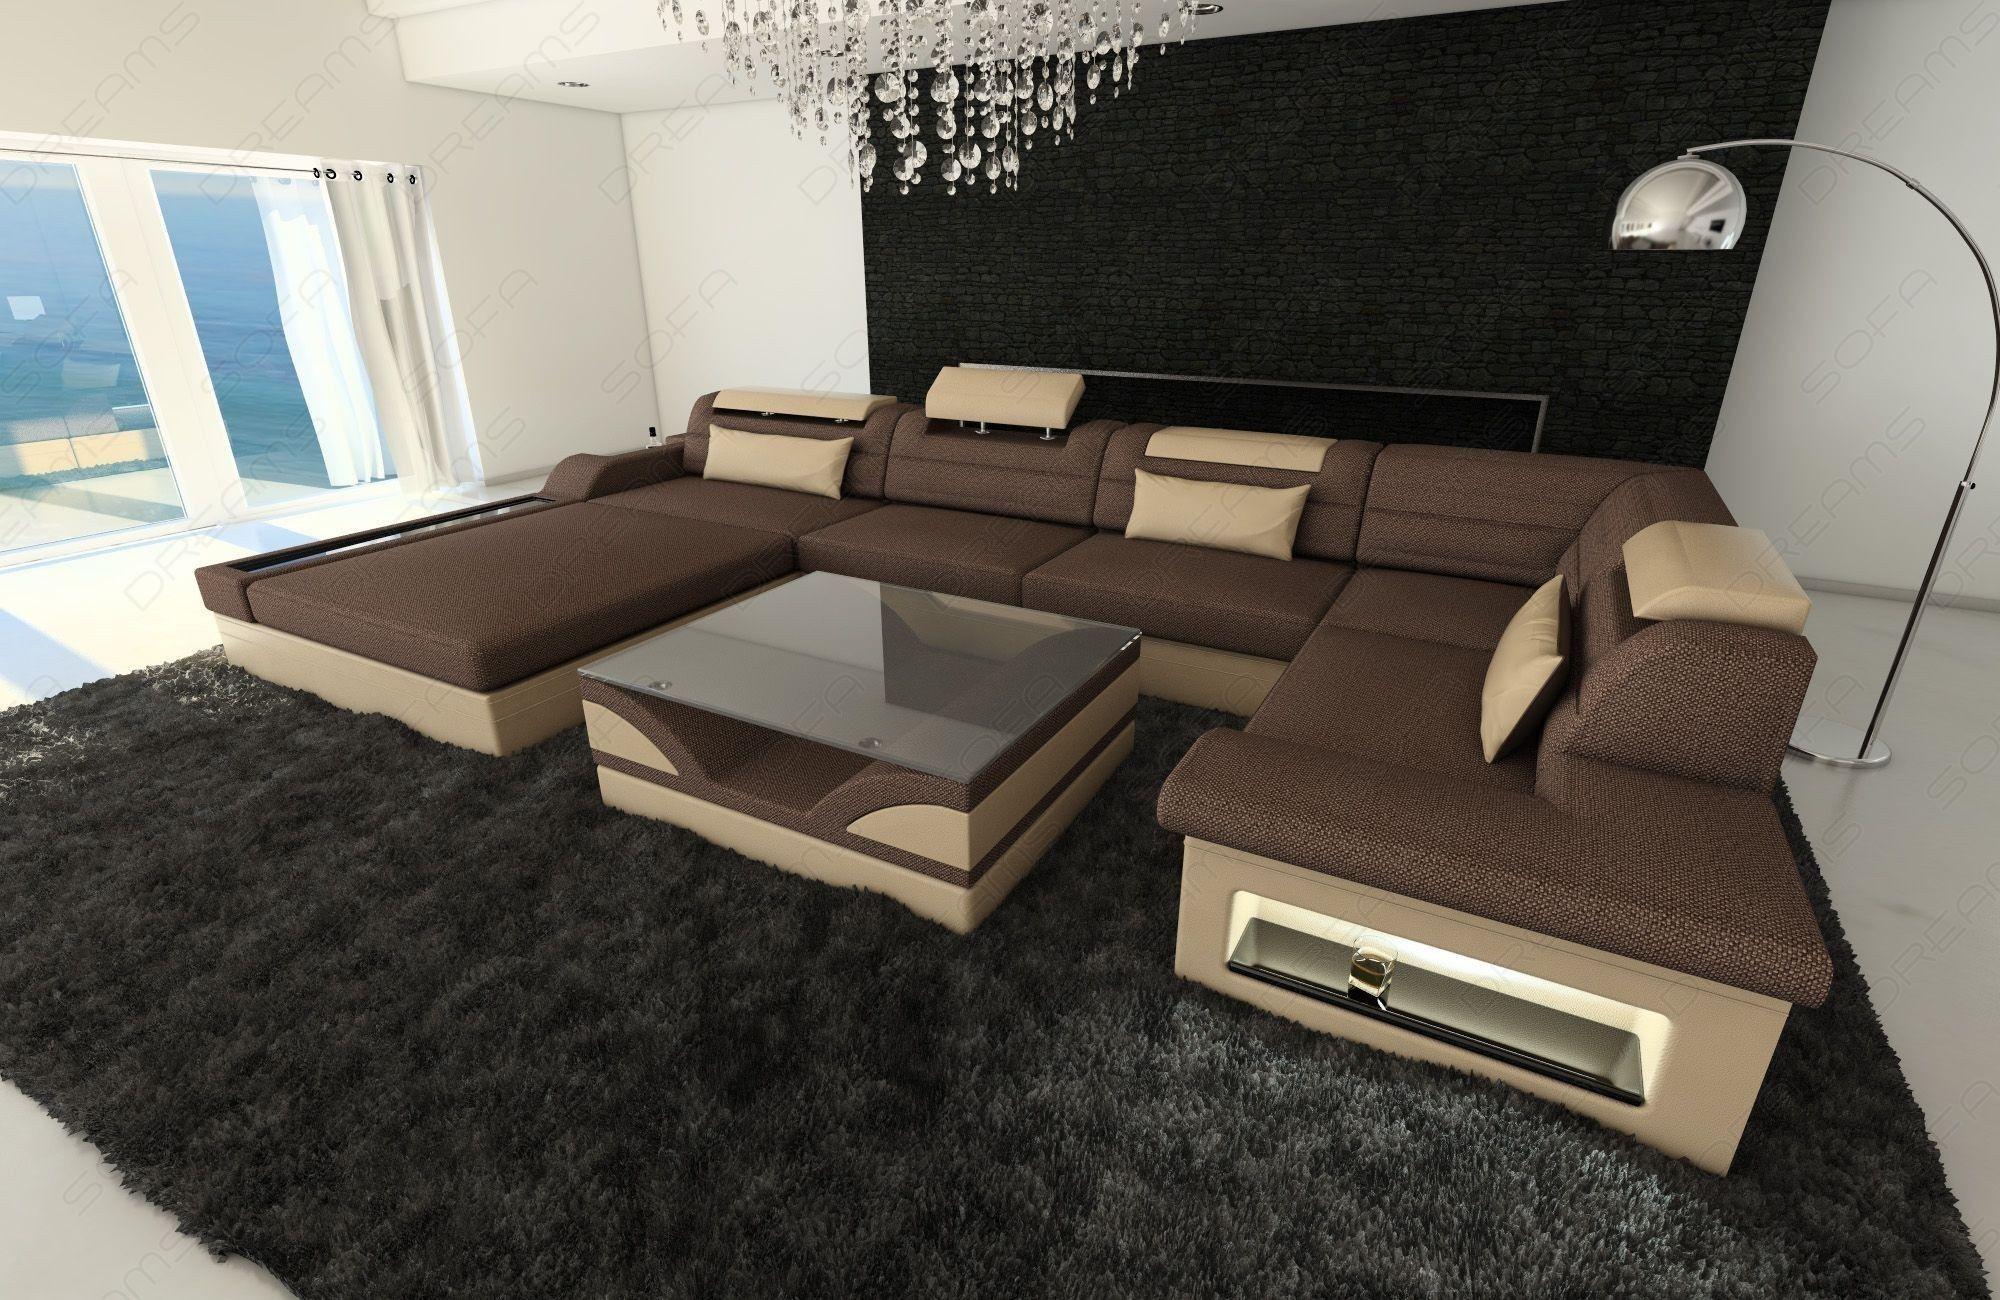 Modern Fabric Sectional Sofa Orlando LED | living room ...